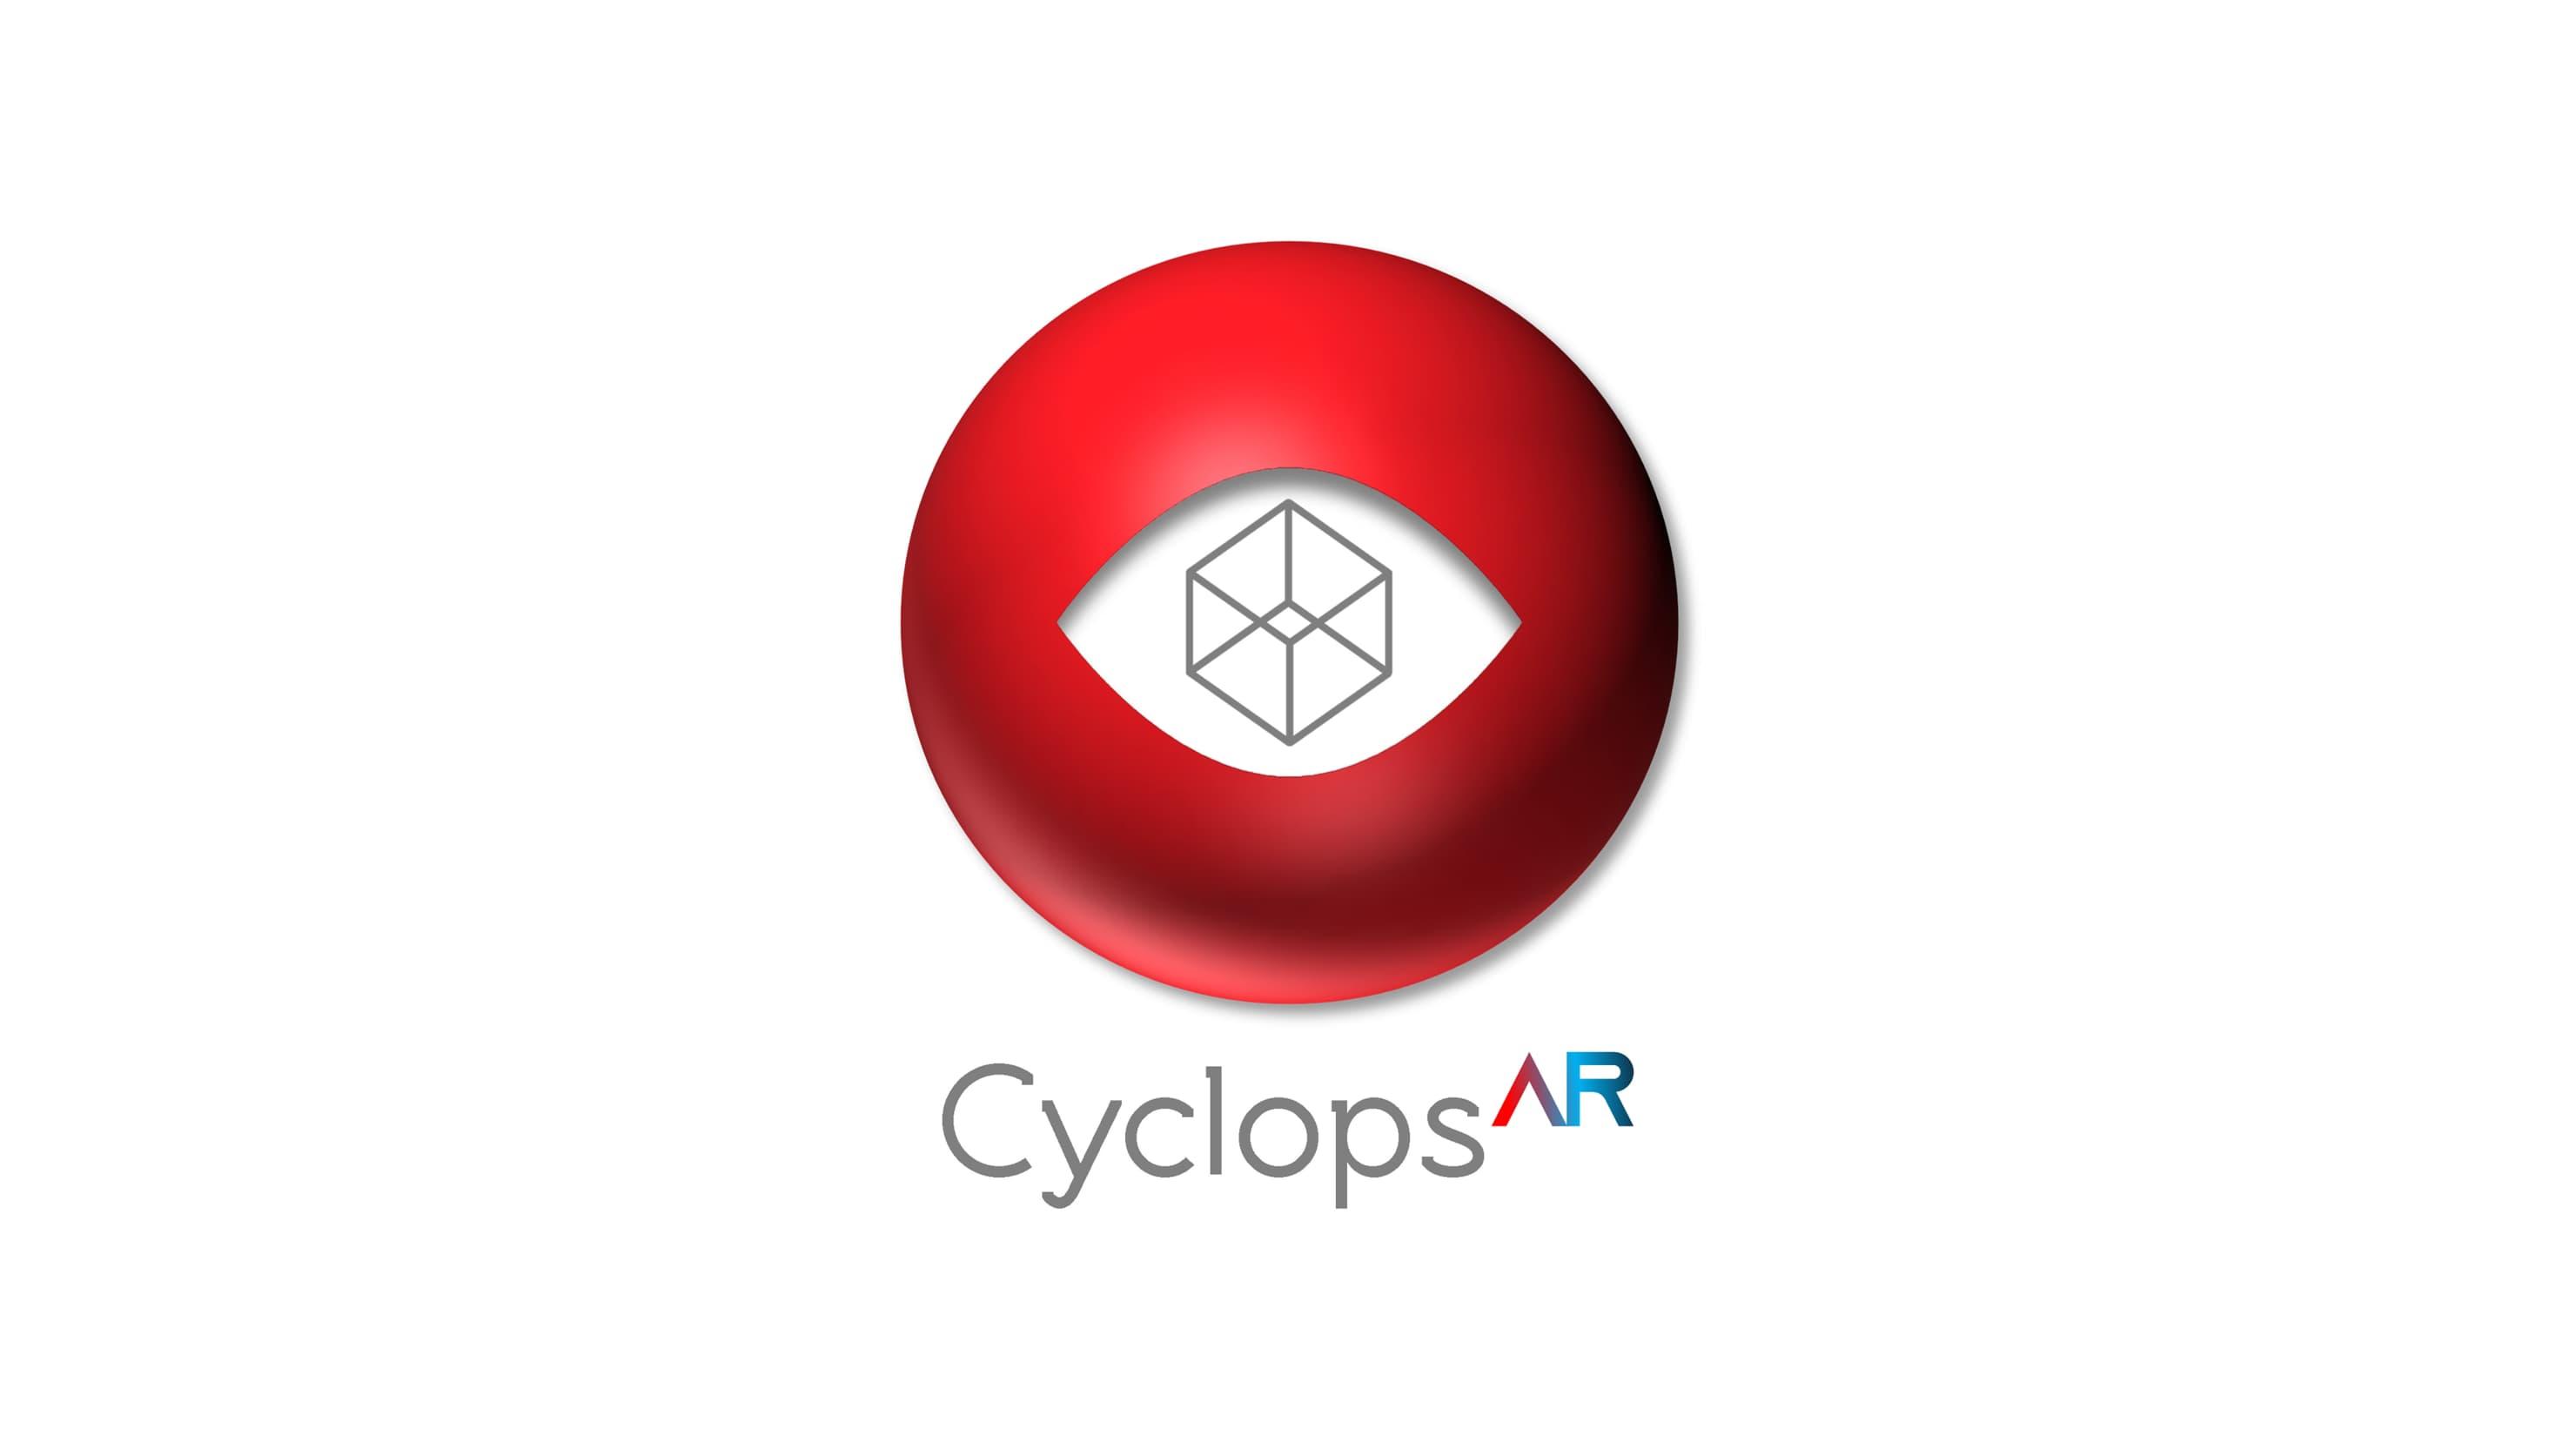 Cyclops AR (HK)